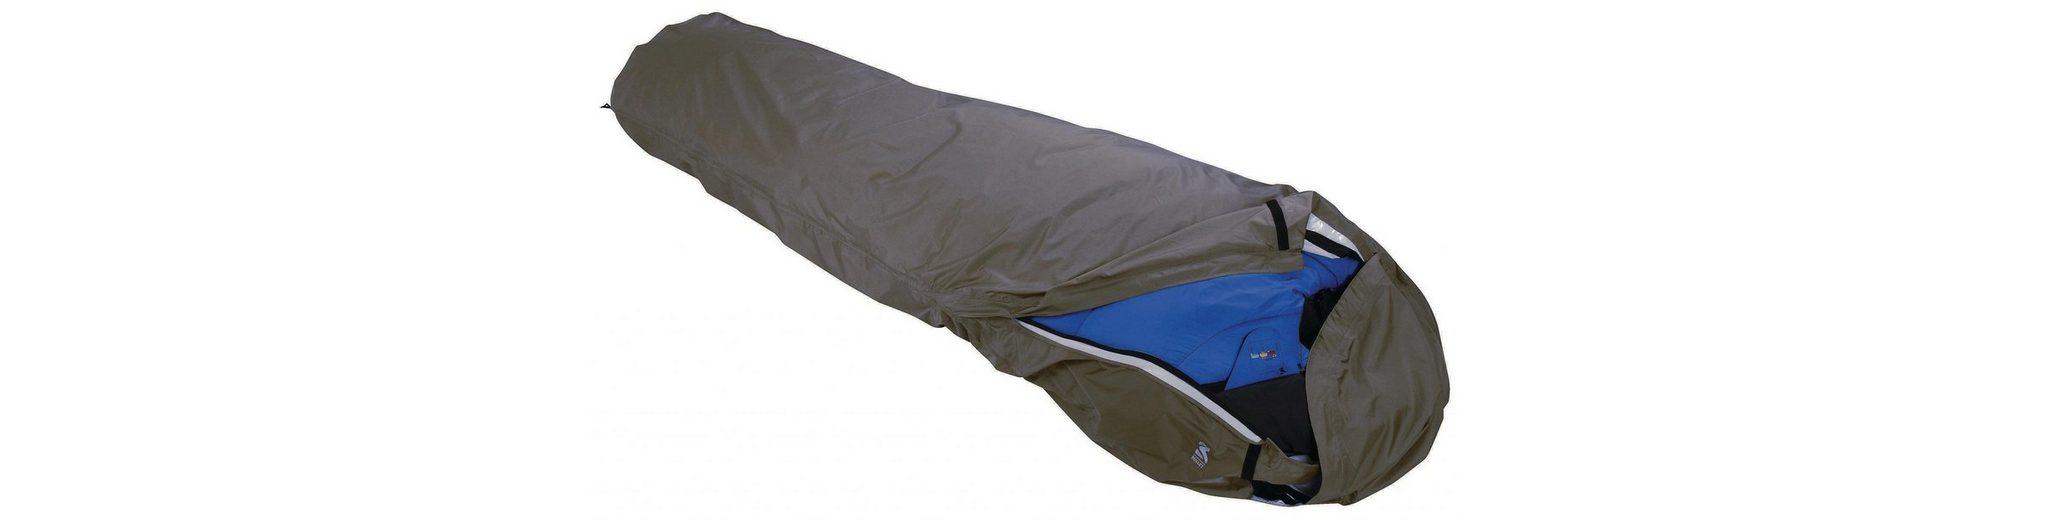 Millet Schlafsack »Bivy Bag«